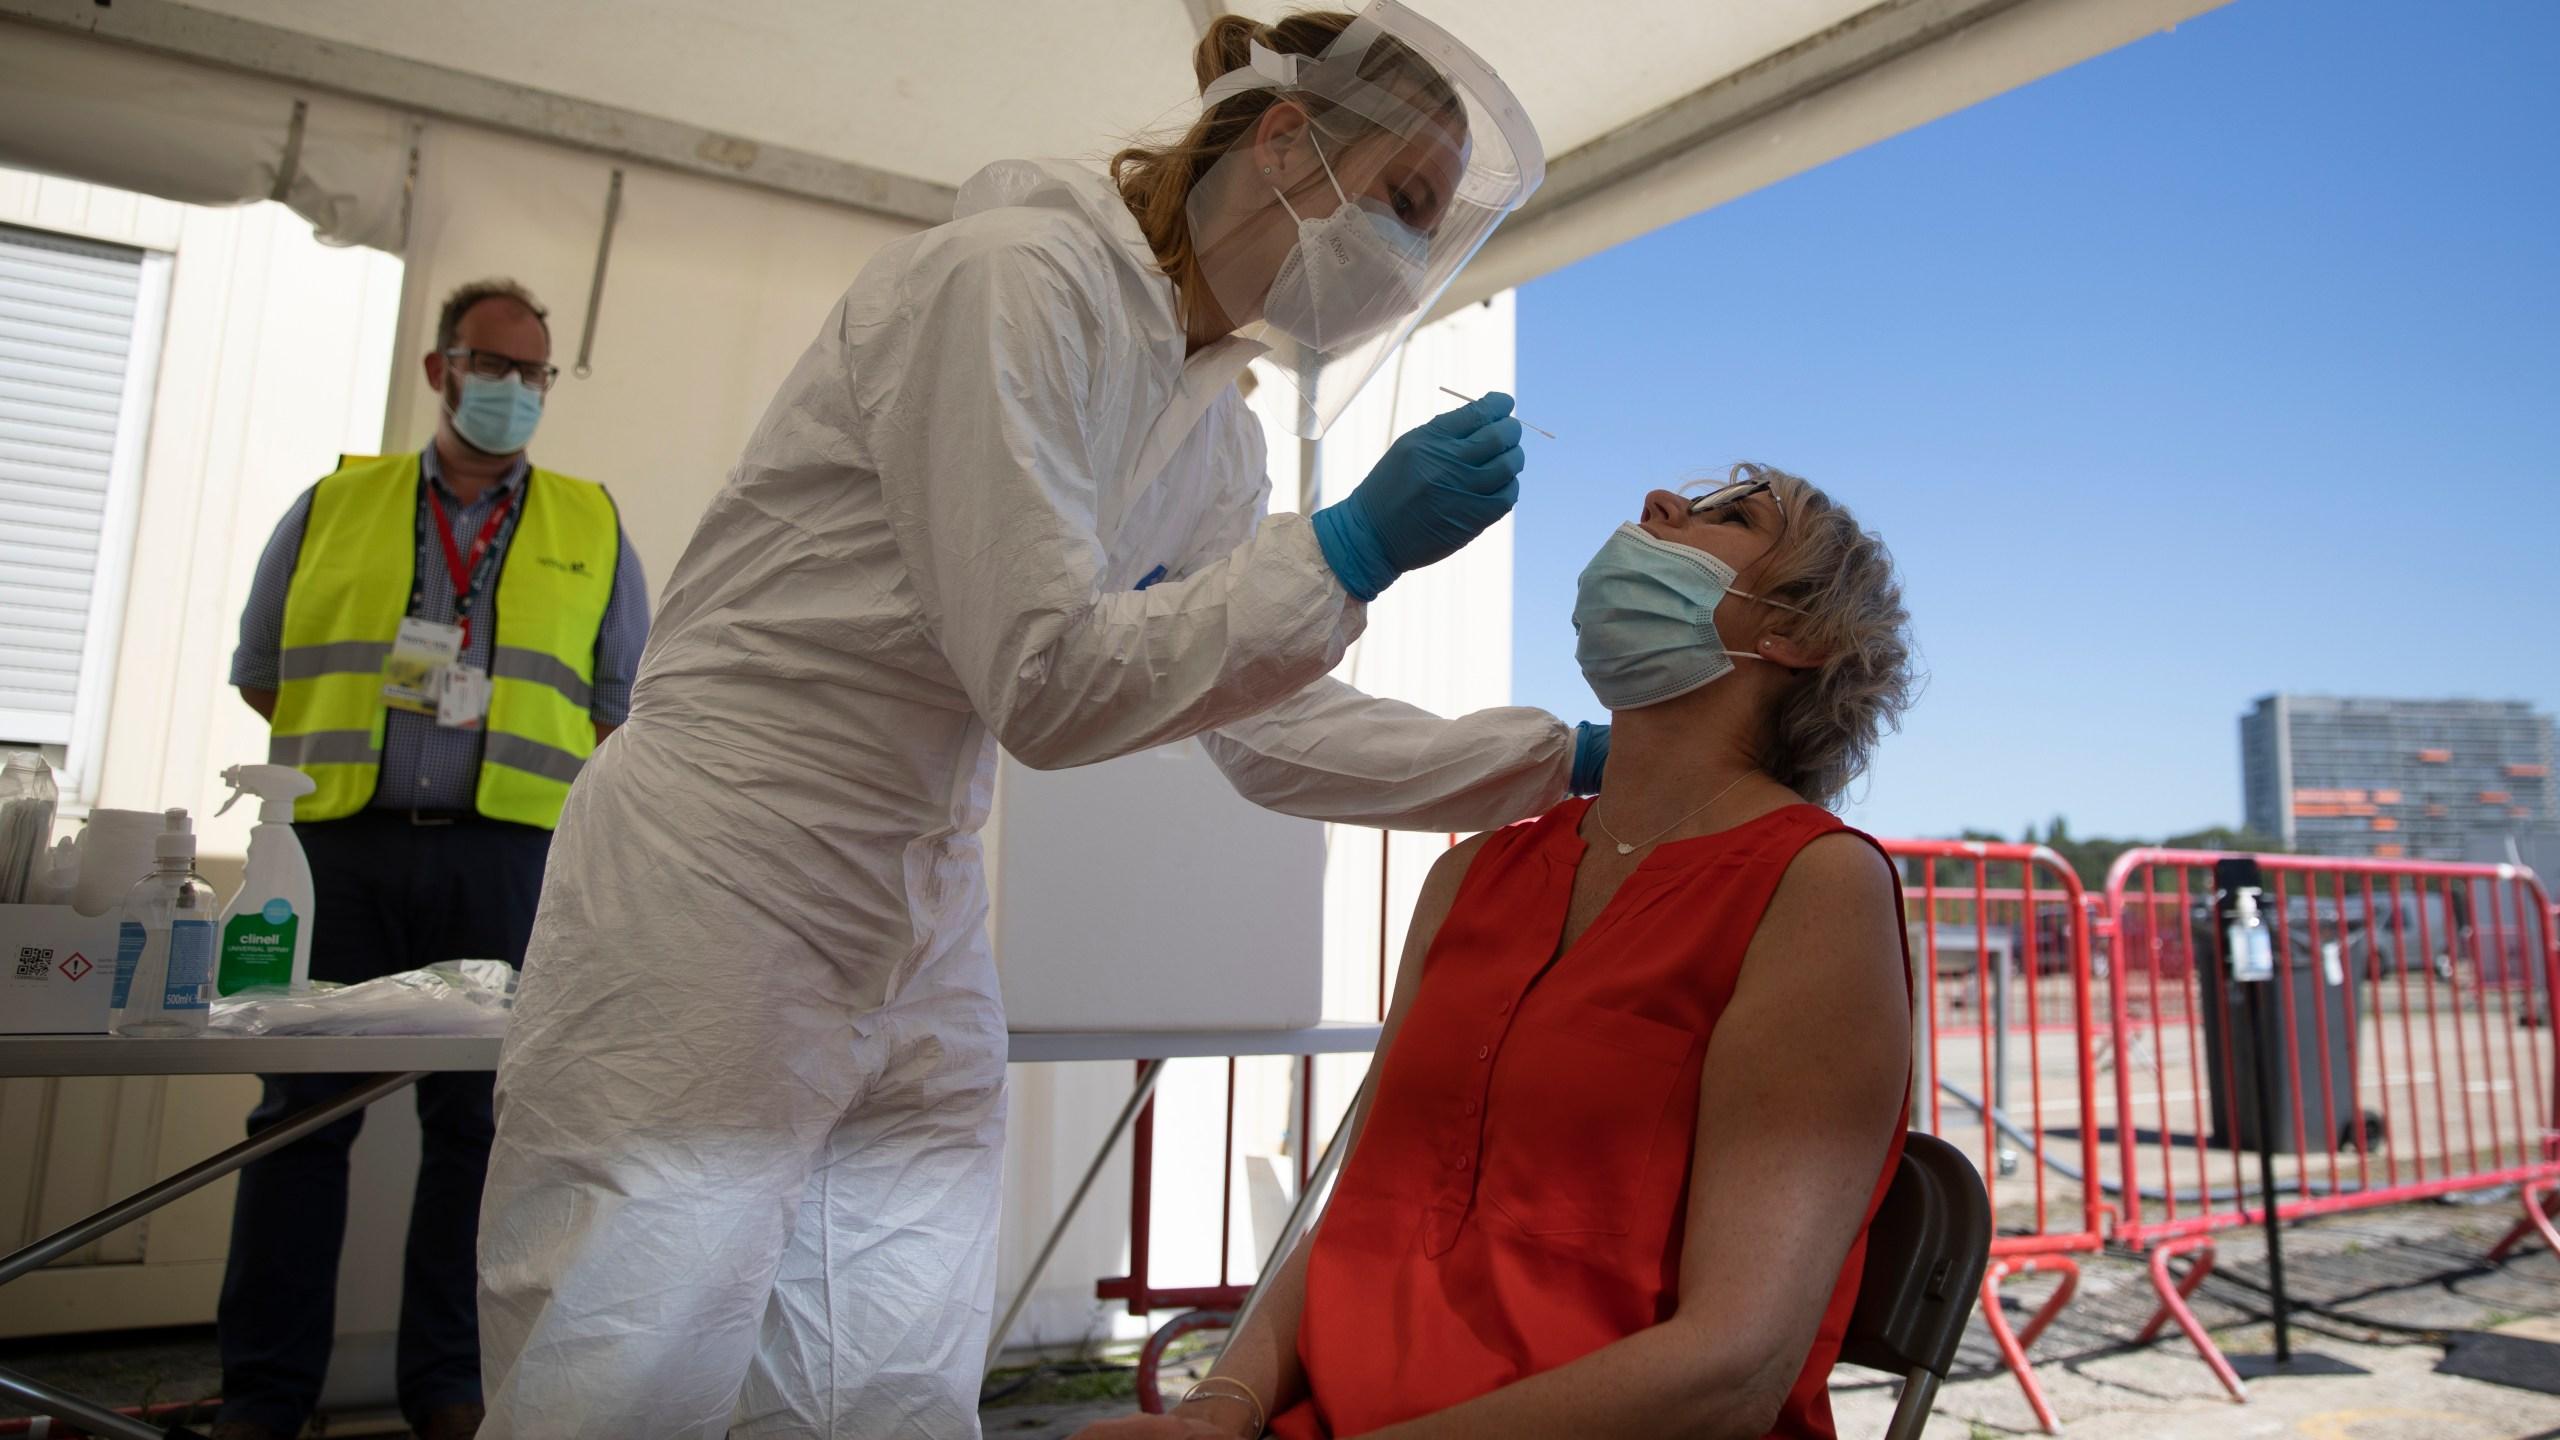 nurse giving a COVID test